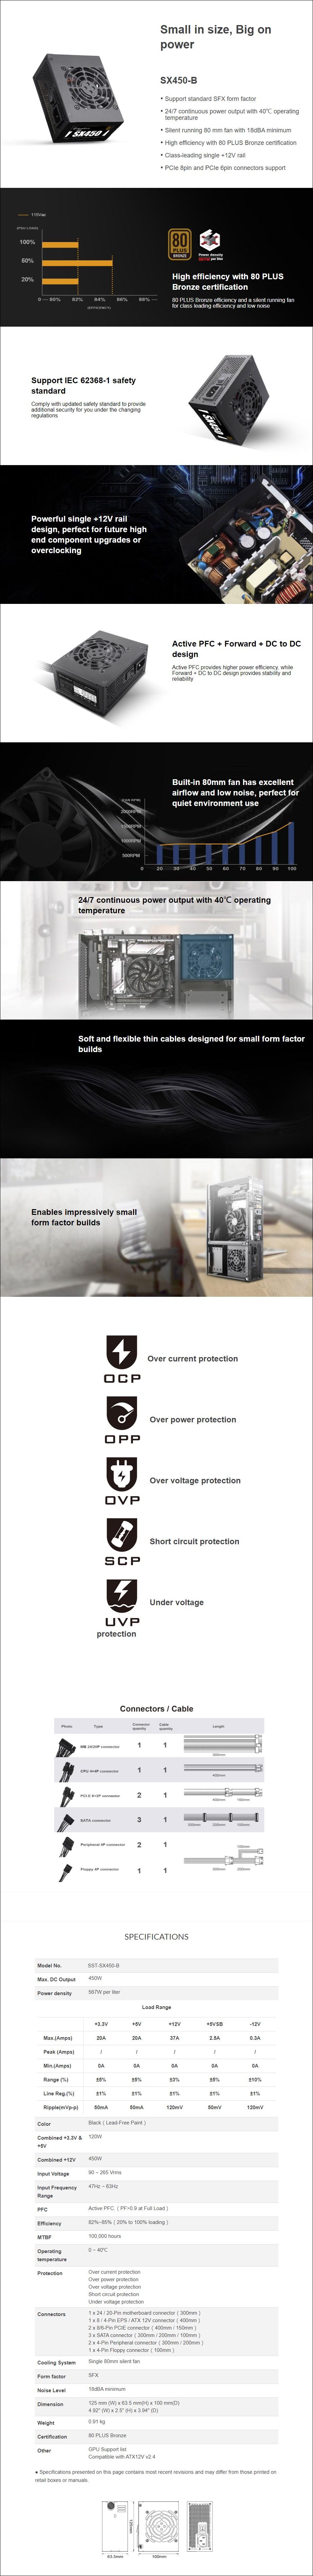 SilverStone SX450-B 450W 80+ Bronze SFX Power Supply - Overview 1